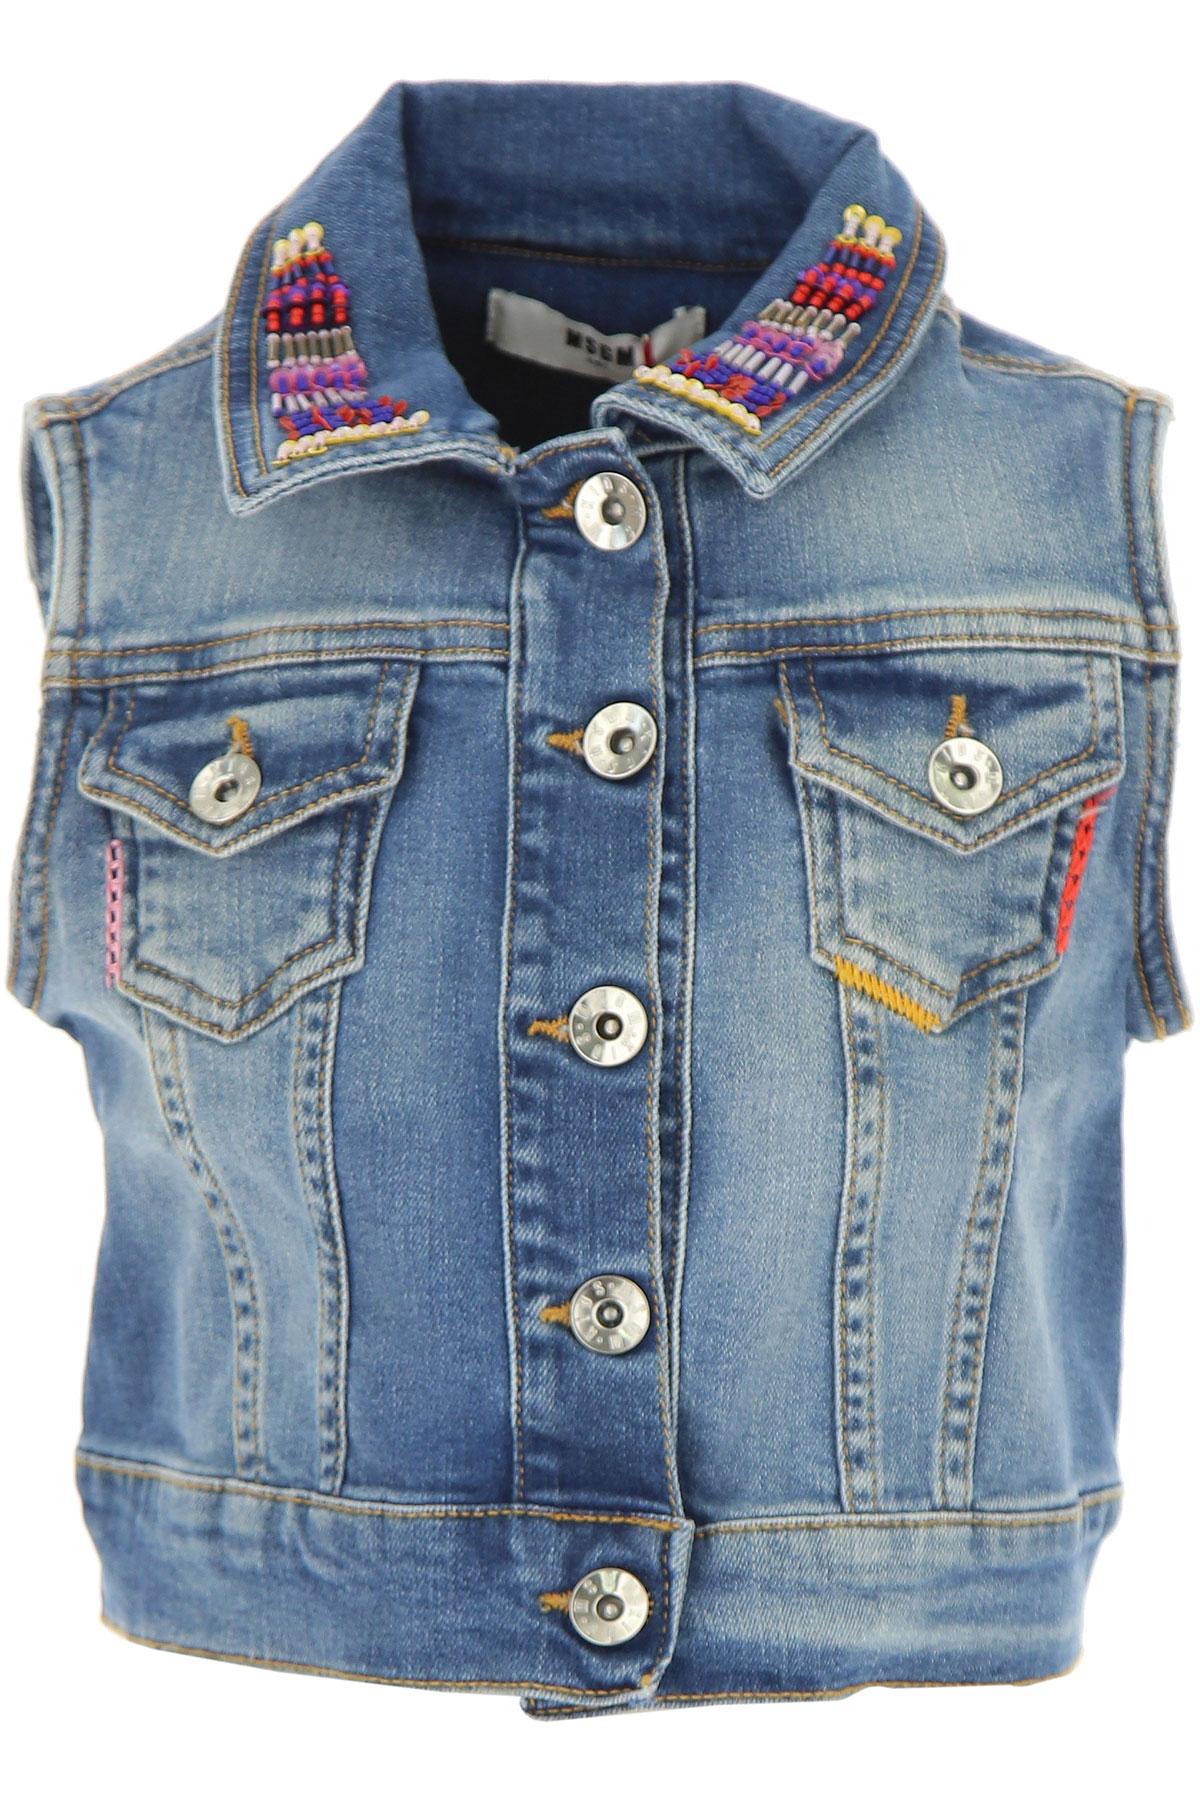 MSGM Kids Jacket for Girls On Sale in Outlet, Blue Denim, Cotton, 2017, 14Y 6Y